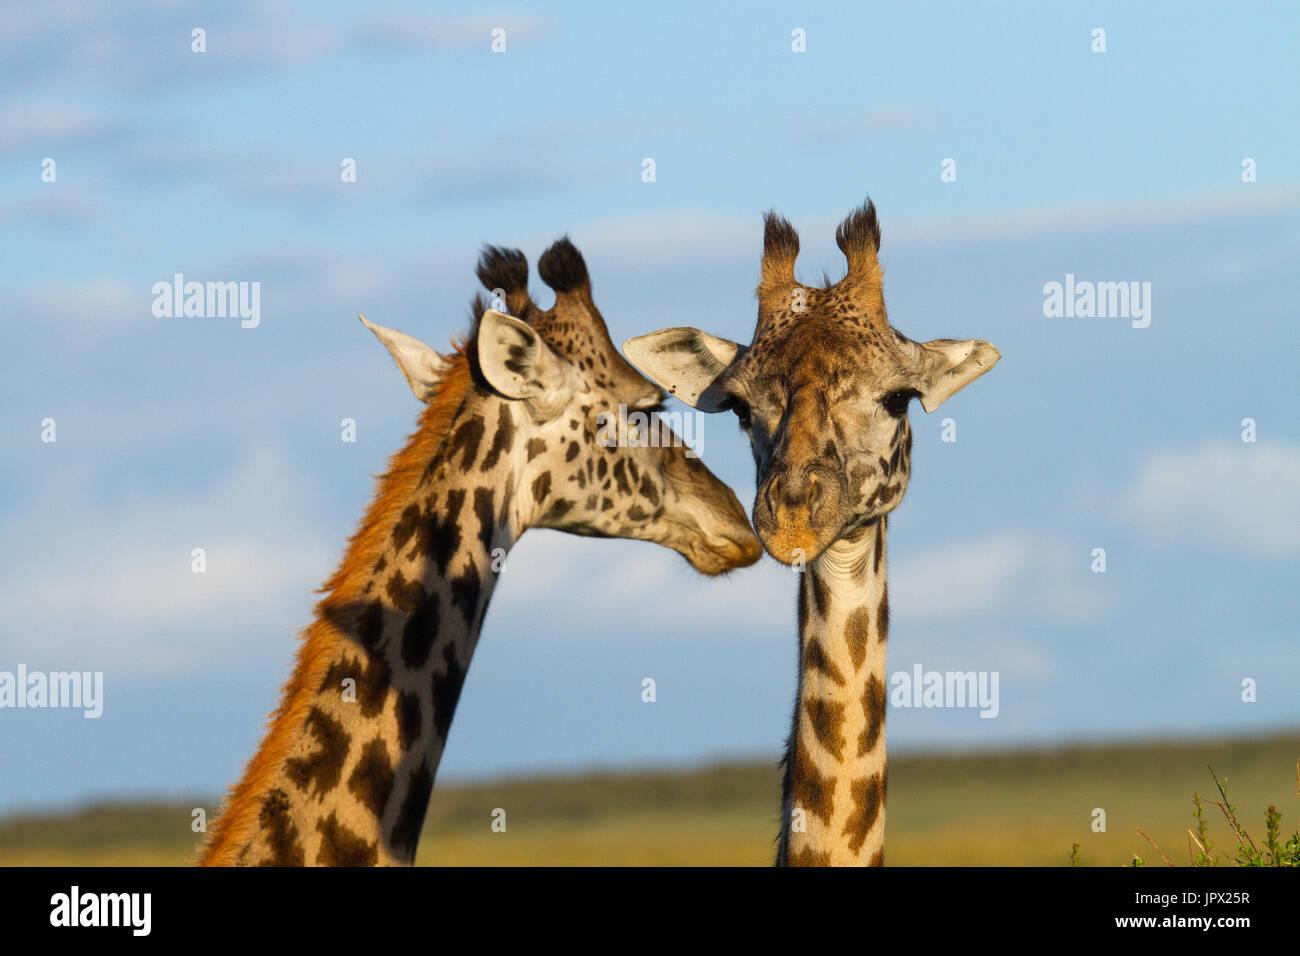 Portrait de masais Girafes dans la savane - Masai Mara, Kenya Photo Stock